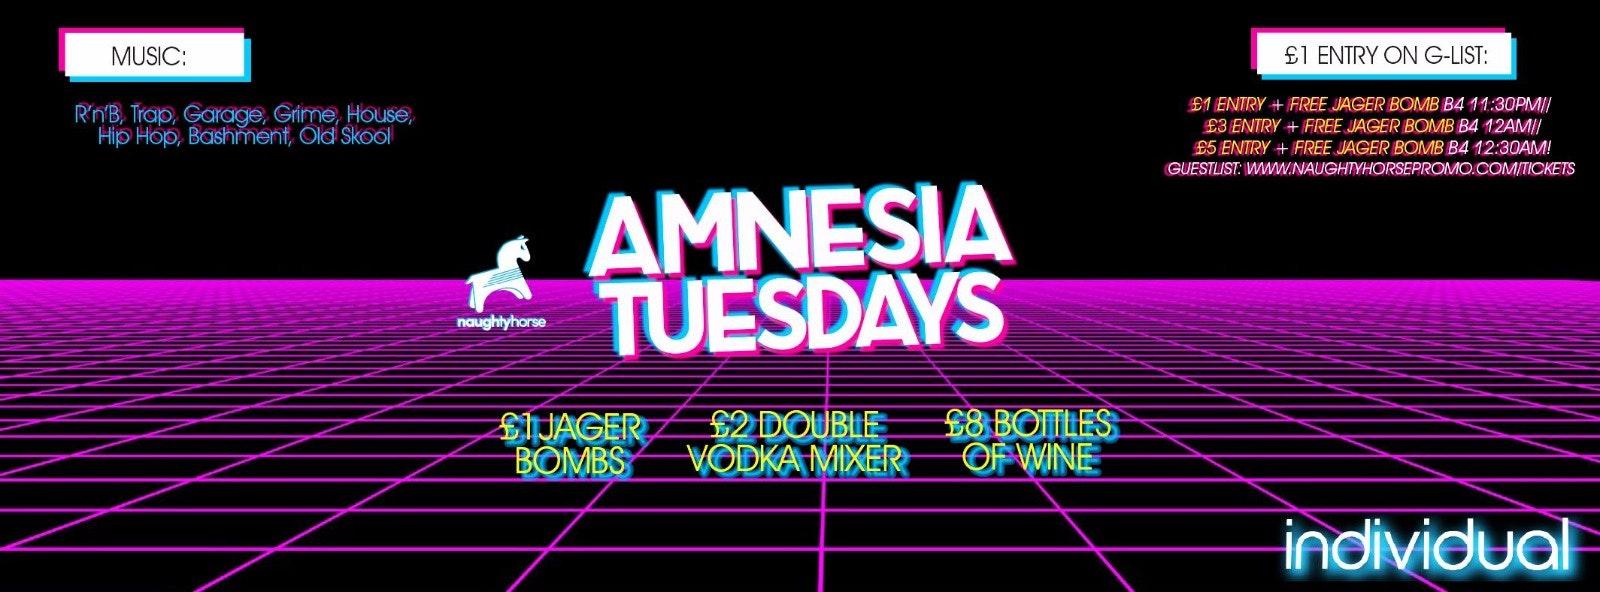 AMNESIA TUESDAYS at Indi (Arcadian) – £1 Entry + FREE J-BOMB guestlist!